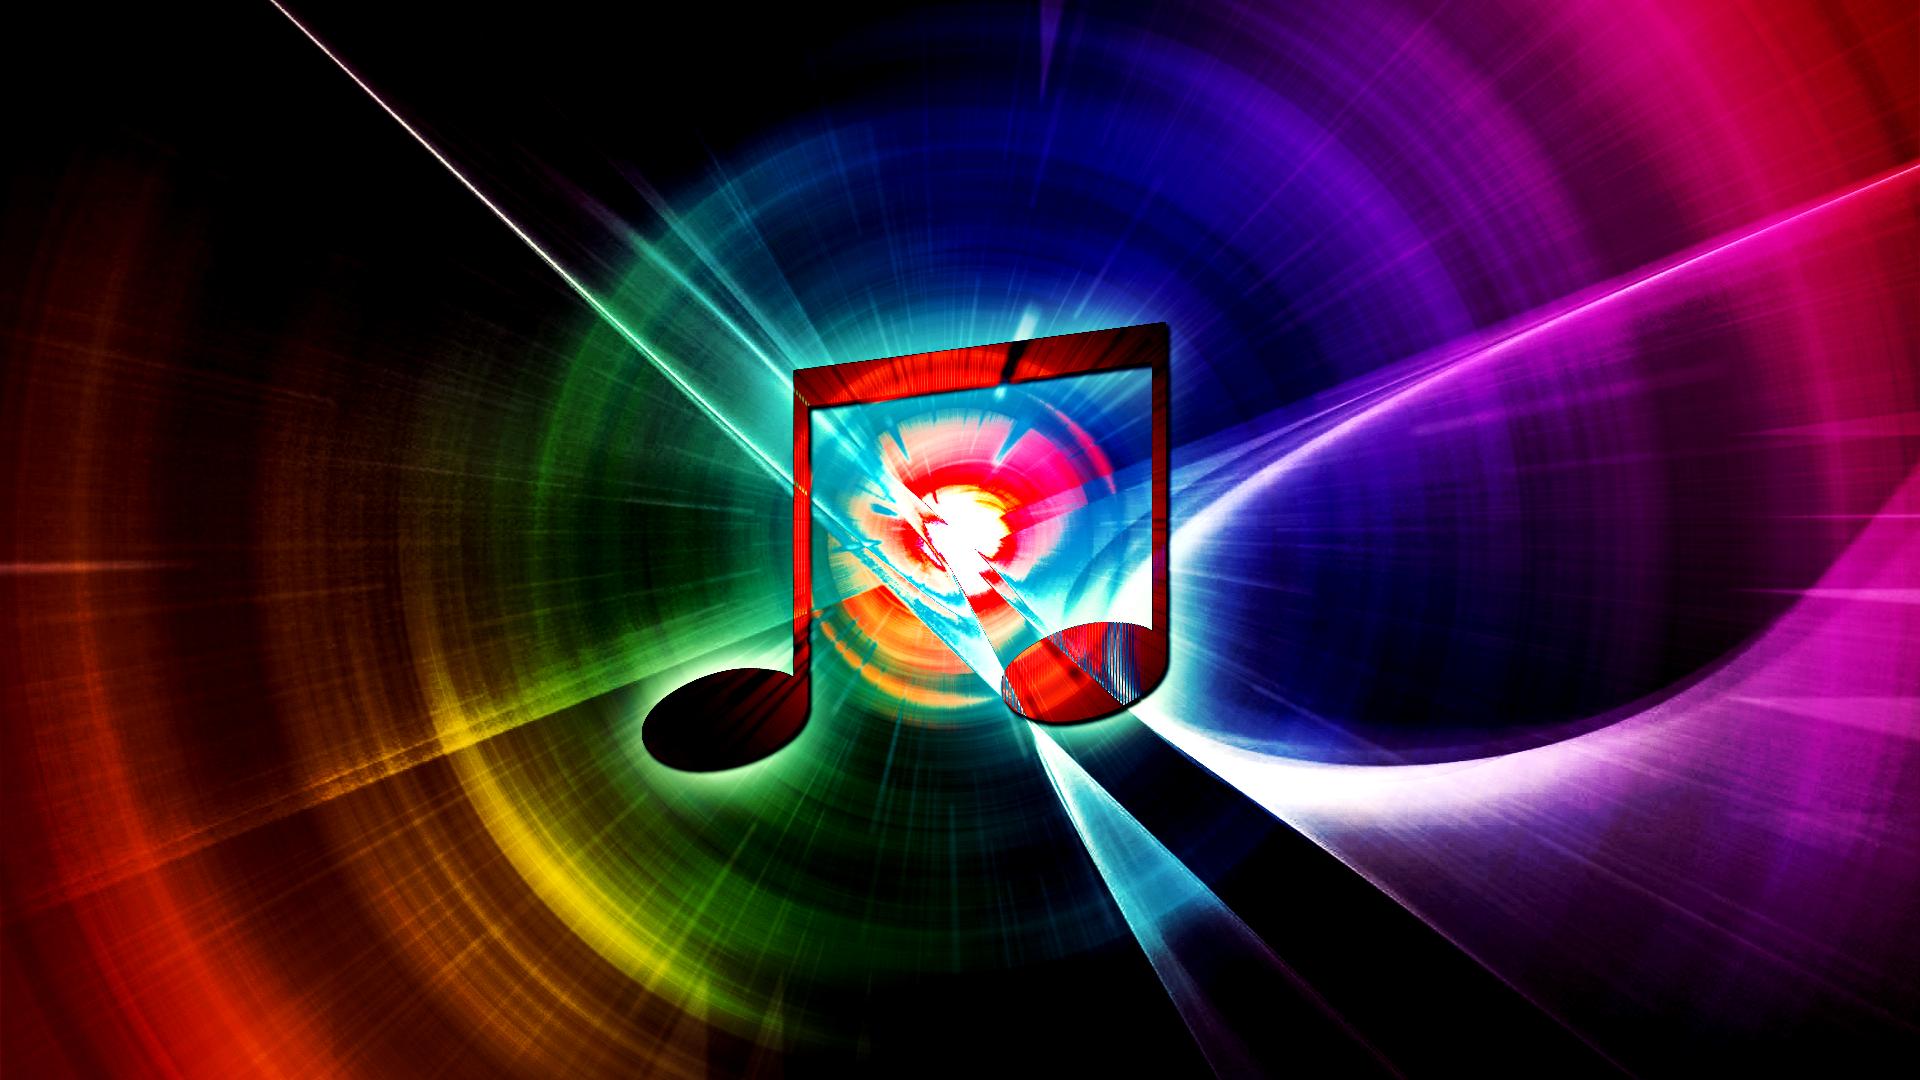 Awesome Music Wallpapers - WallpaperSafari